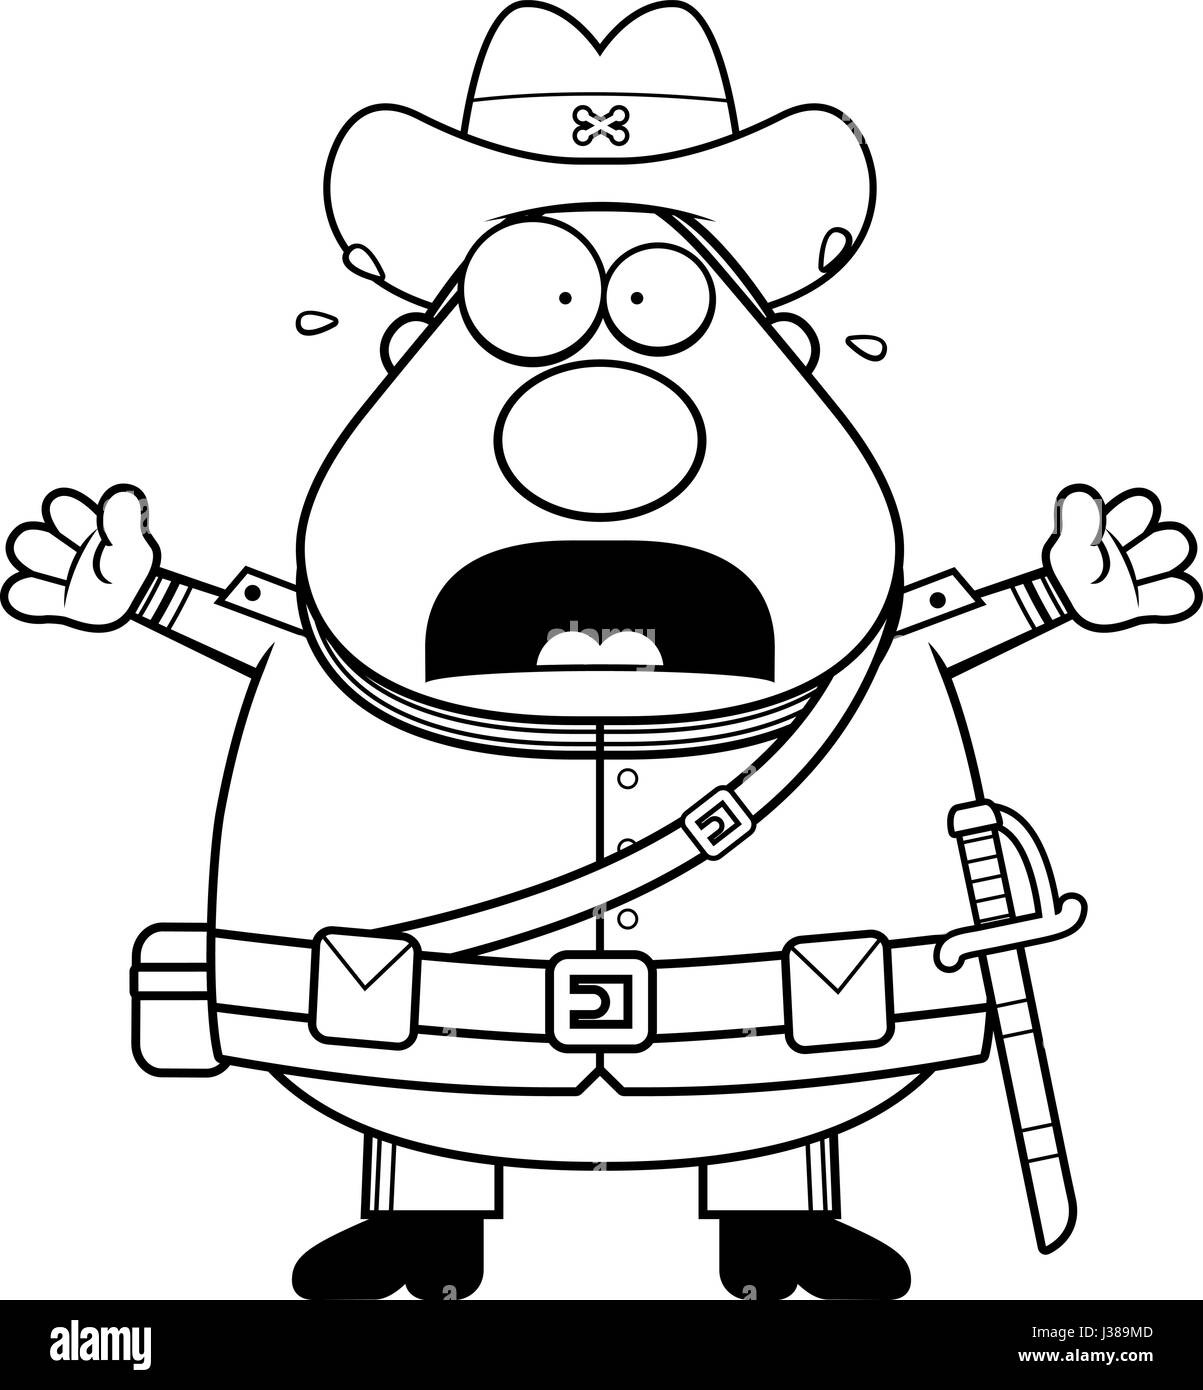 A Cartoon Illustration Of A Civil War Confederate Soldier Looking